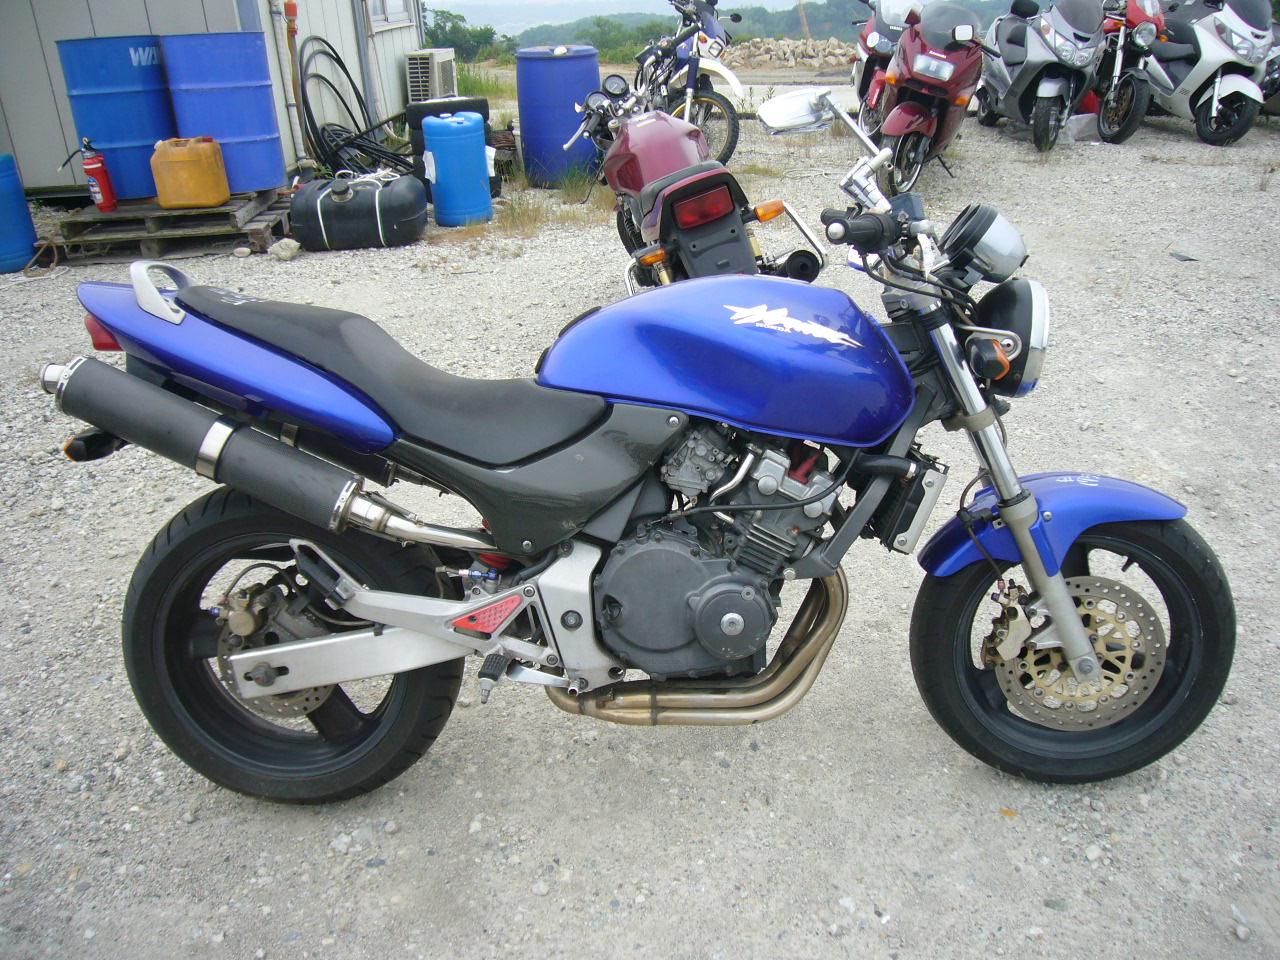 Технические характеристики мотоцикла Racer Nitro 250